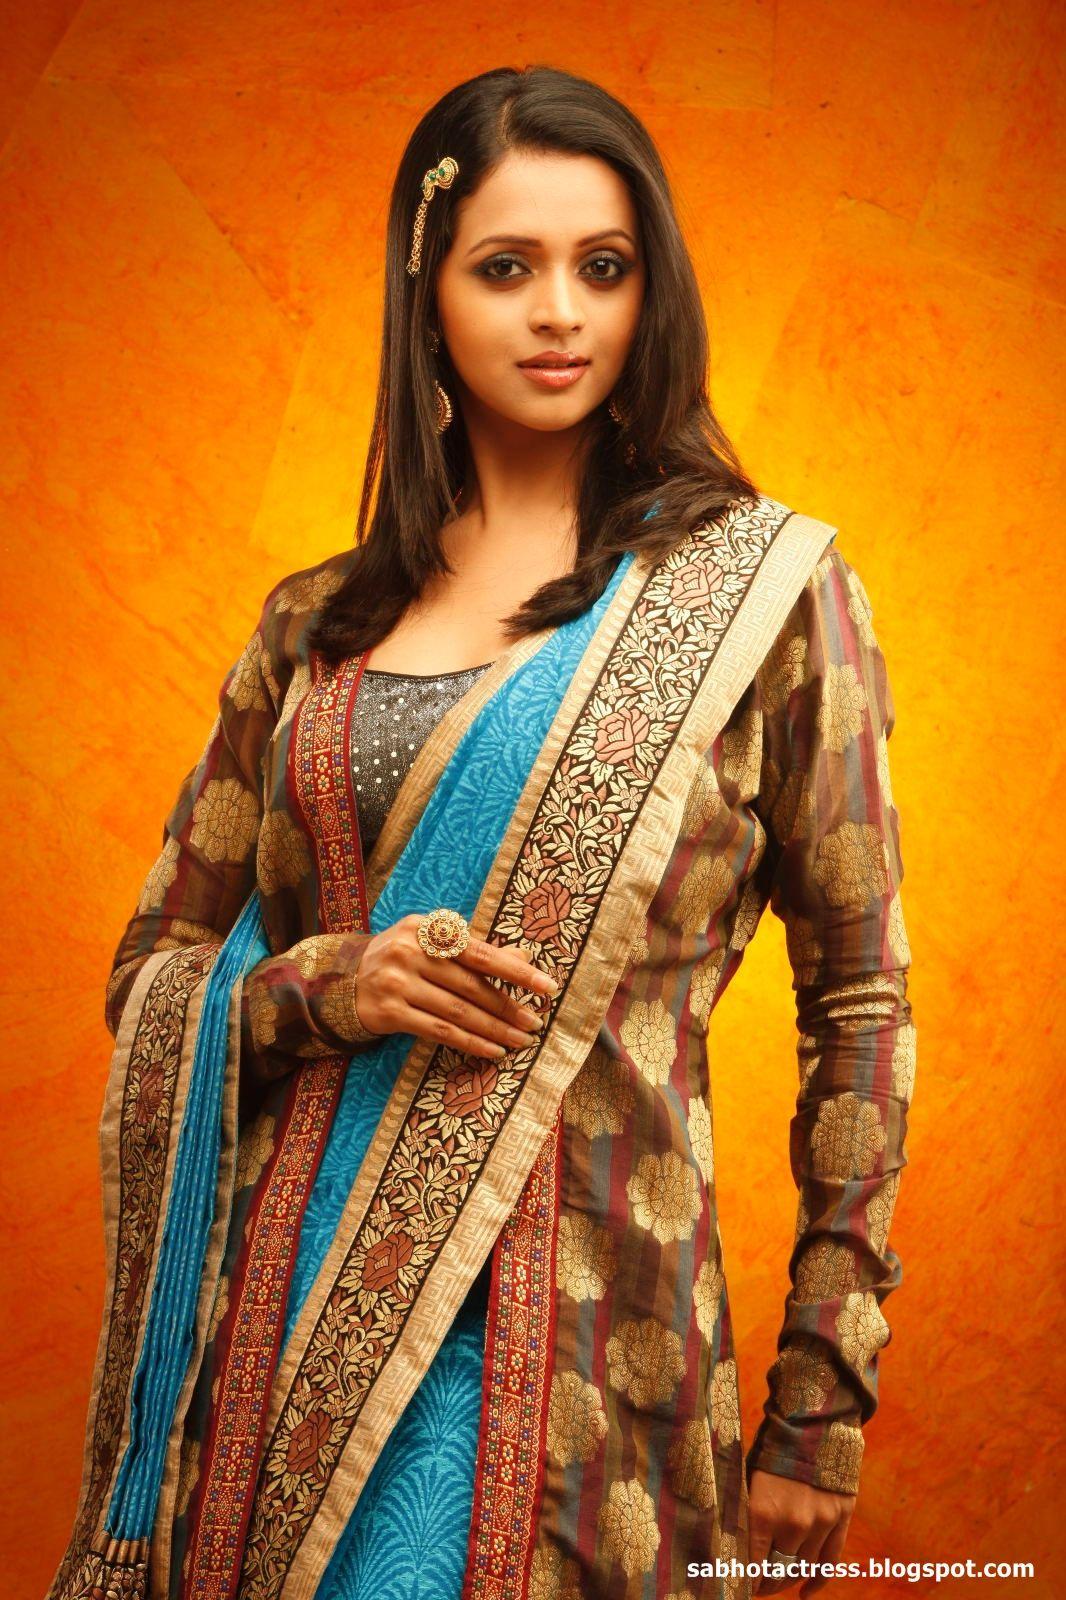 Happy Birthday Nayanthara! Film Title, New Film Announced